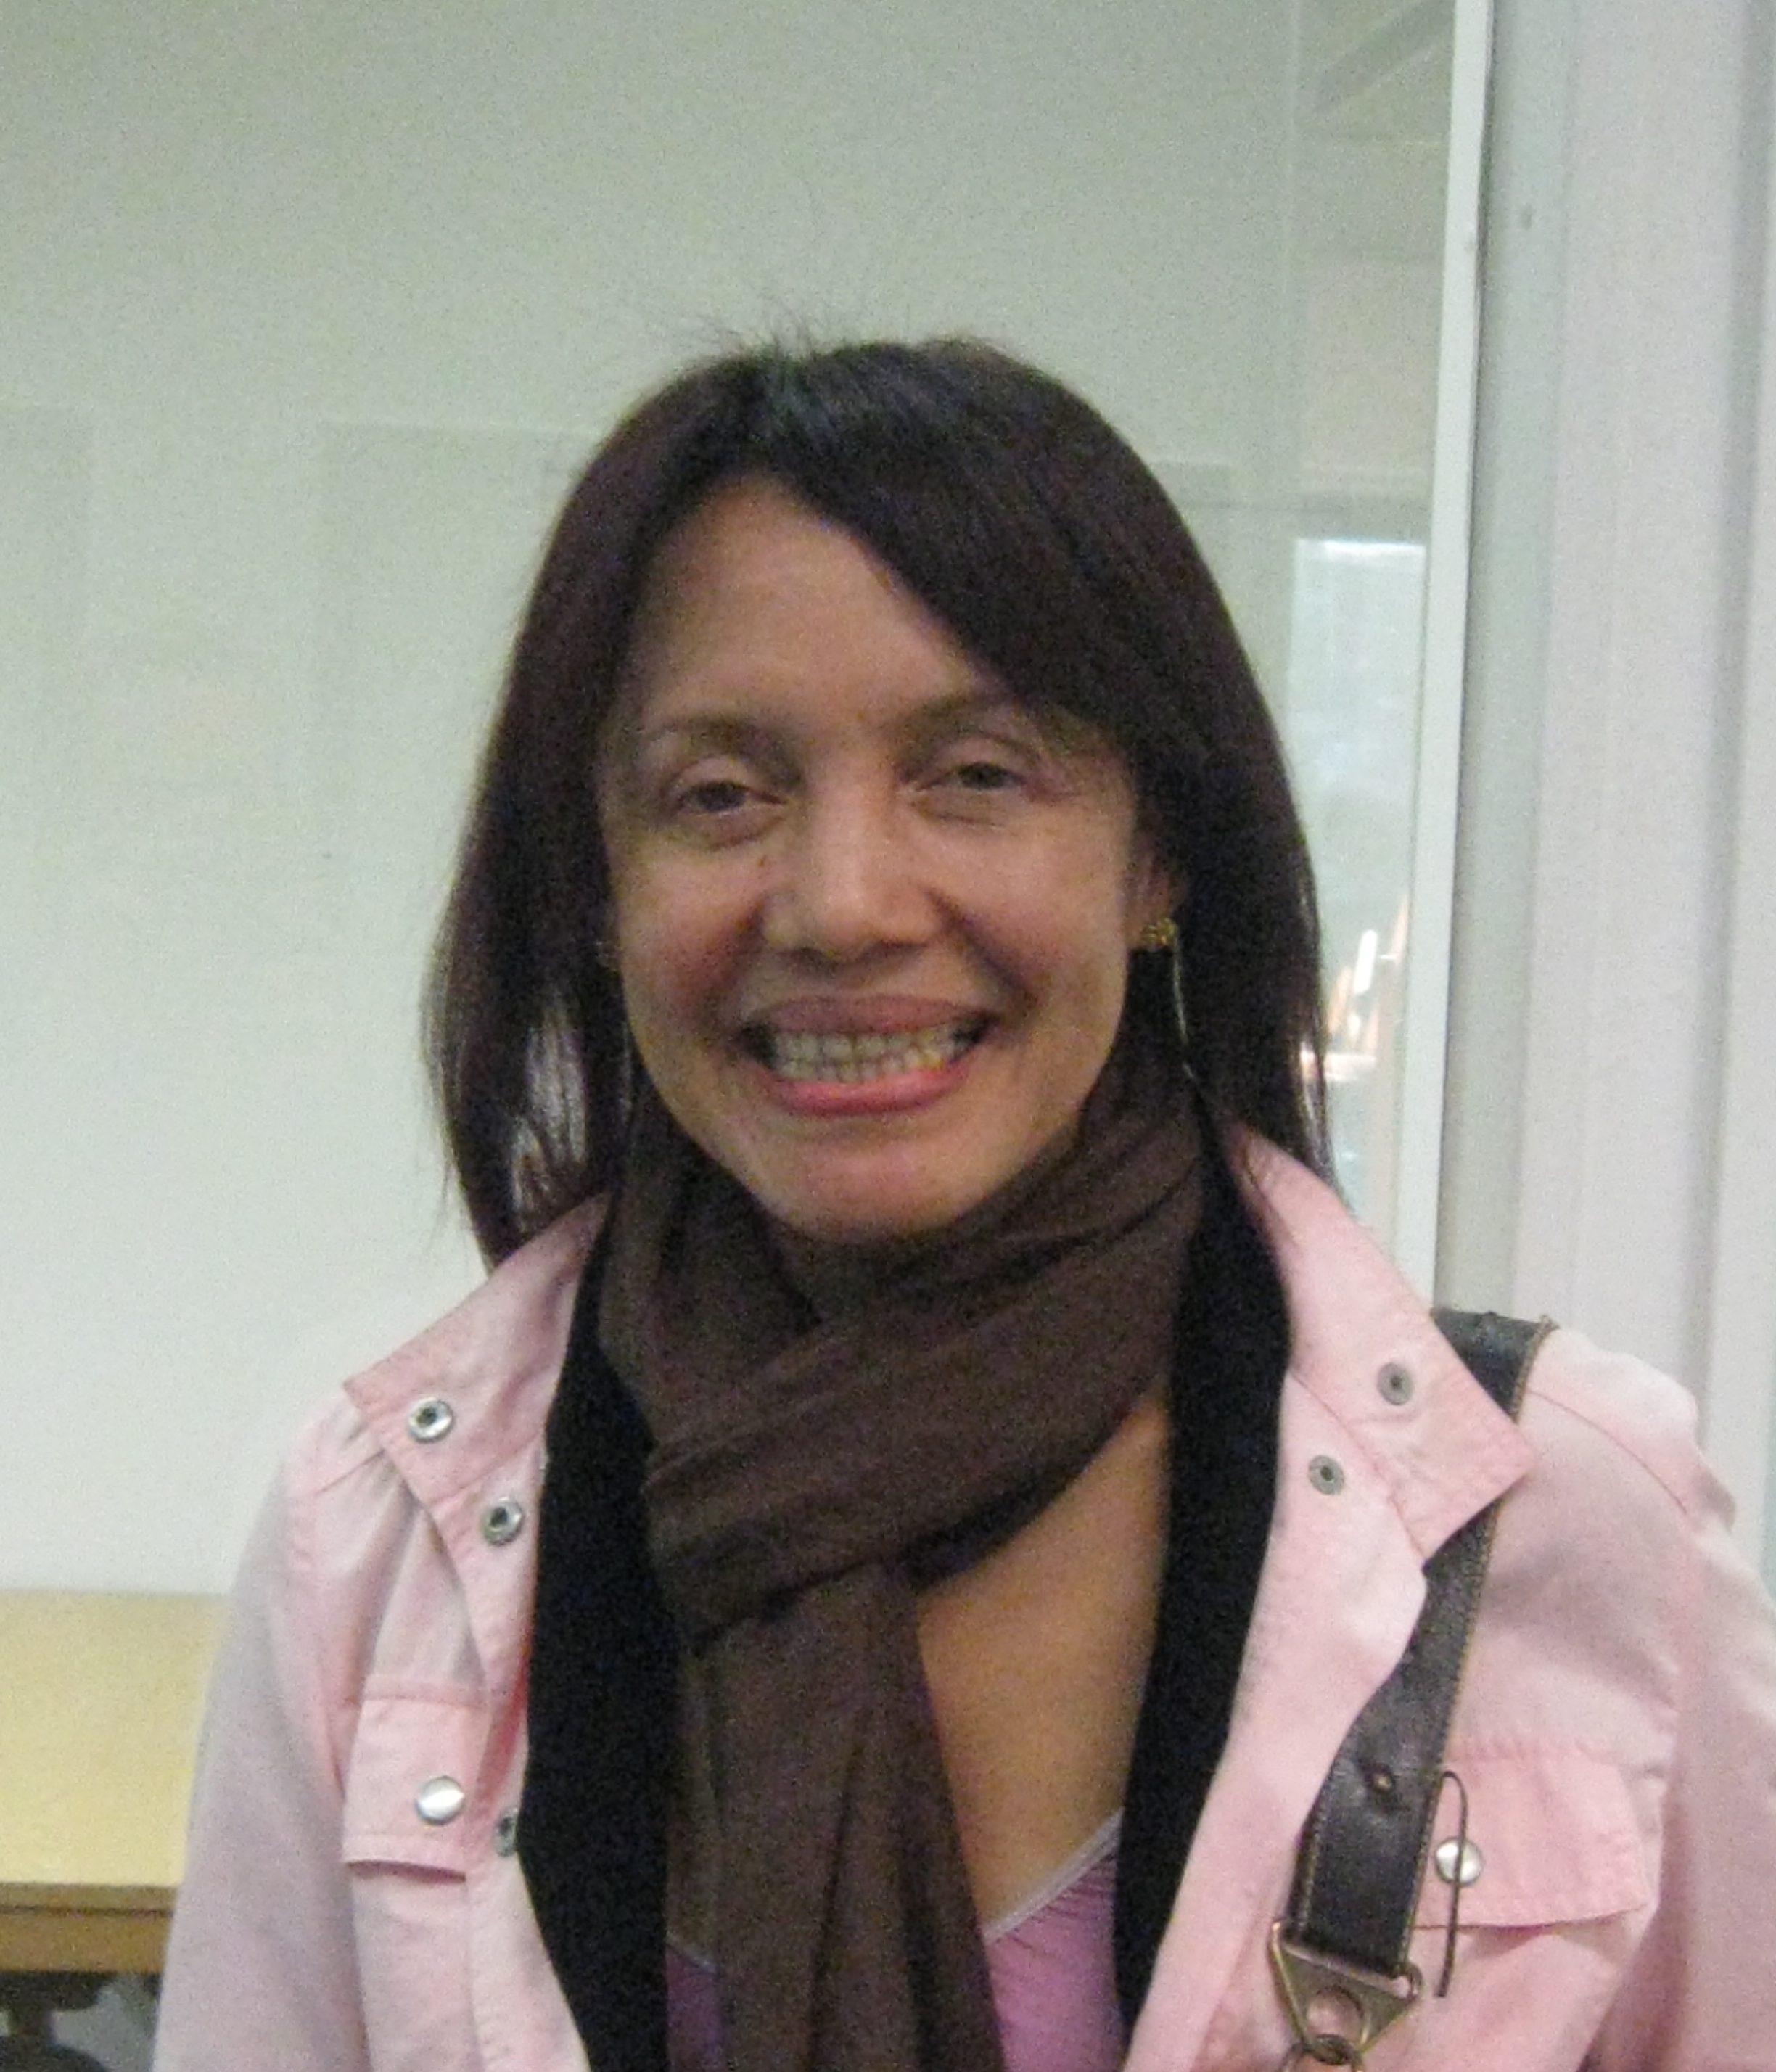 Eneida Pérez a la imortalidad deportiva; Pérez la más grande ajedrecista dominicana